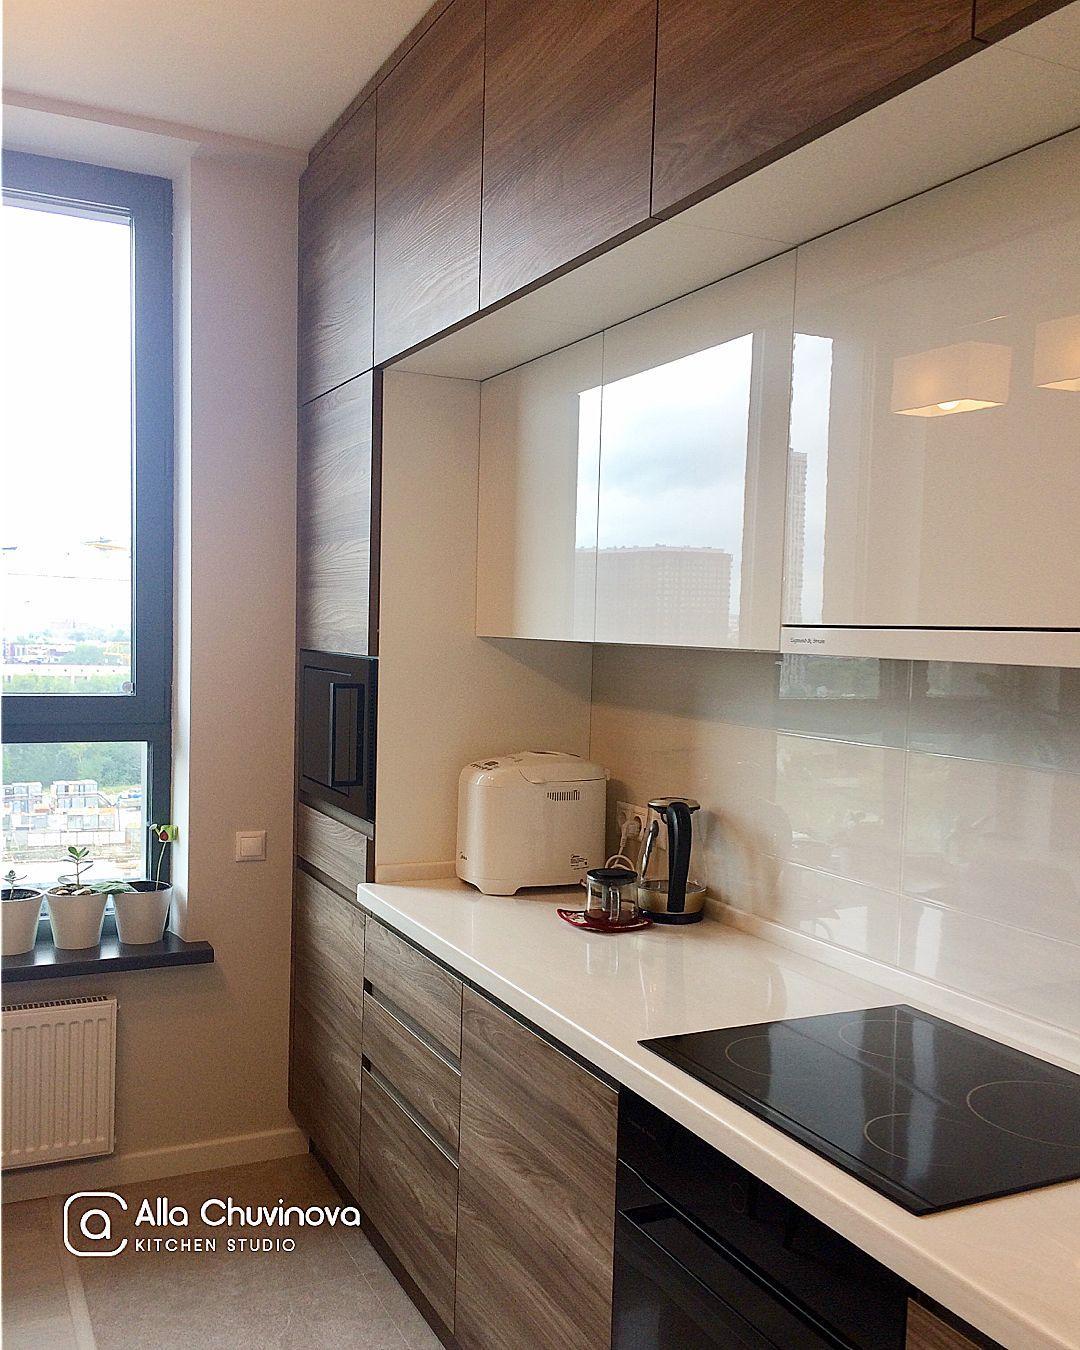 Allauvinova  also sleek inspiring luxury kitchen design ideas photos interior rh pinterest